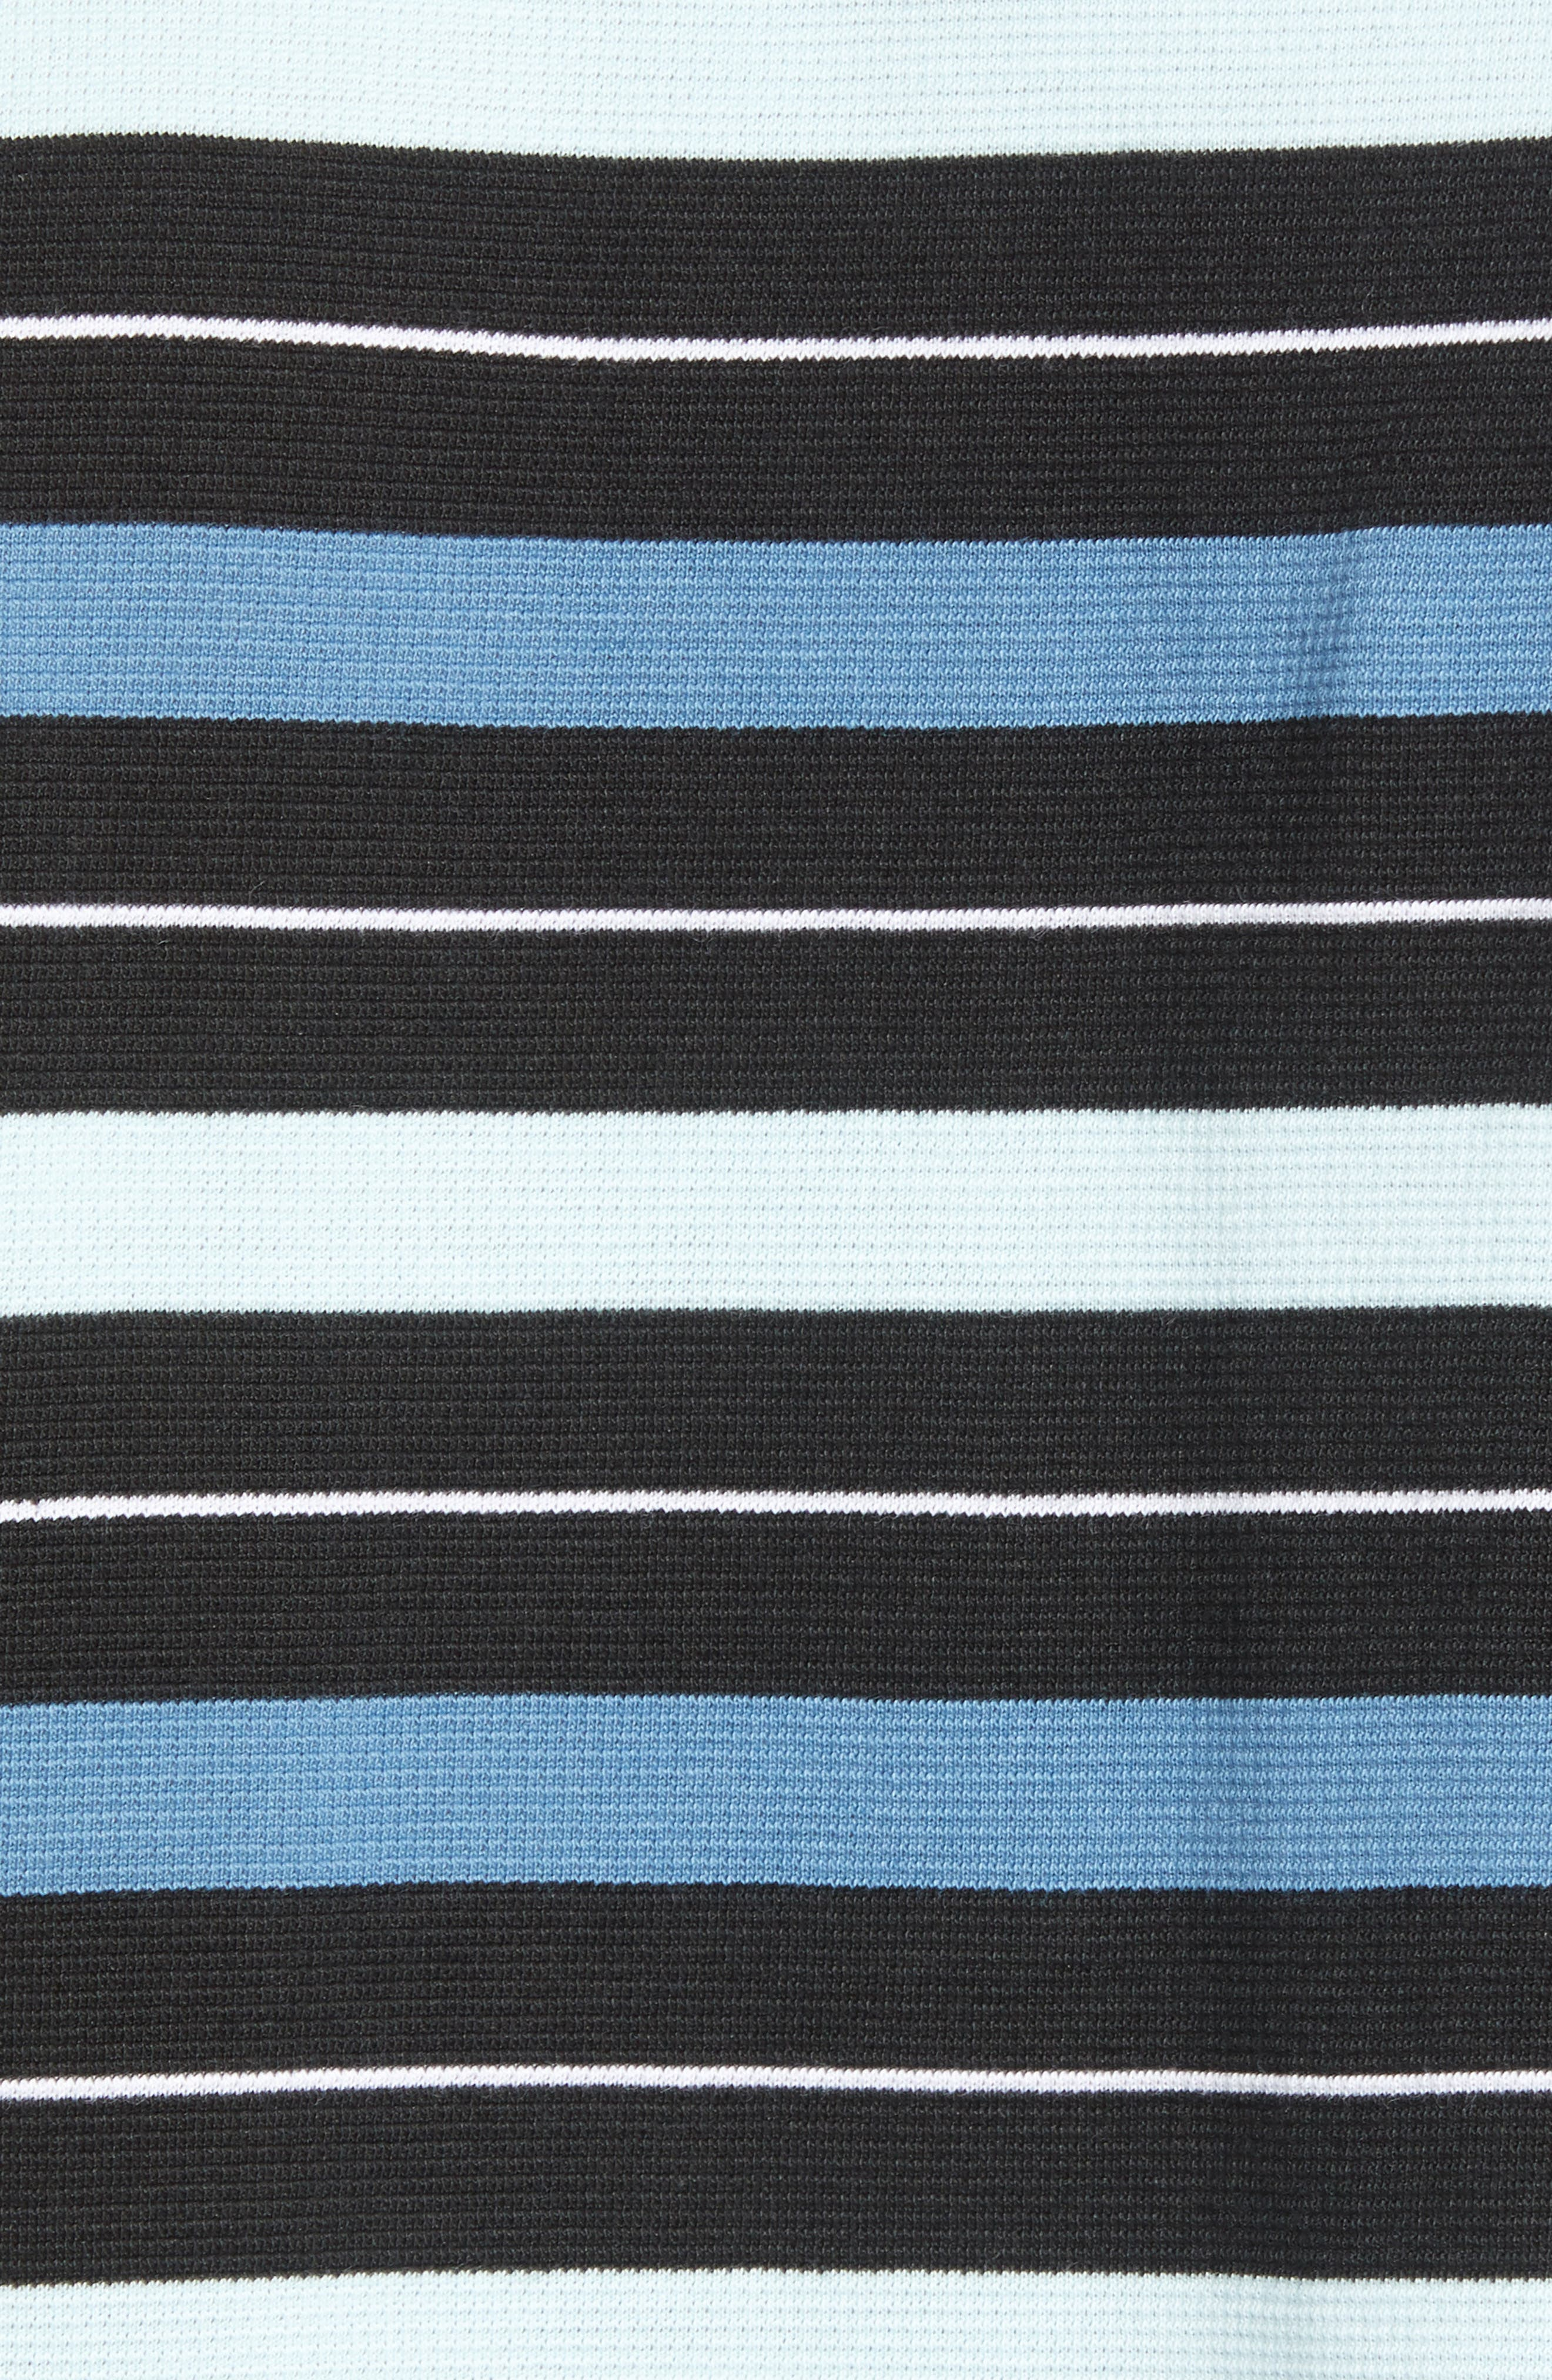 LACOSTE, Super Light Stripe Piqué Polo, Alternate thumbnail 5, color, BLACK/ AQUARIUM-WHITE-NEOTTIA